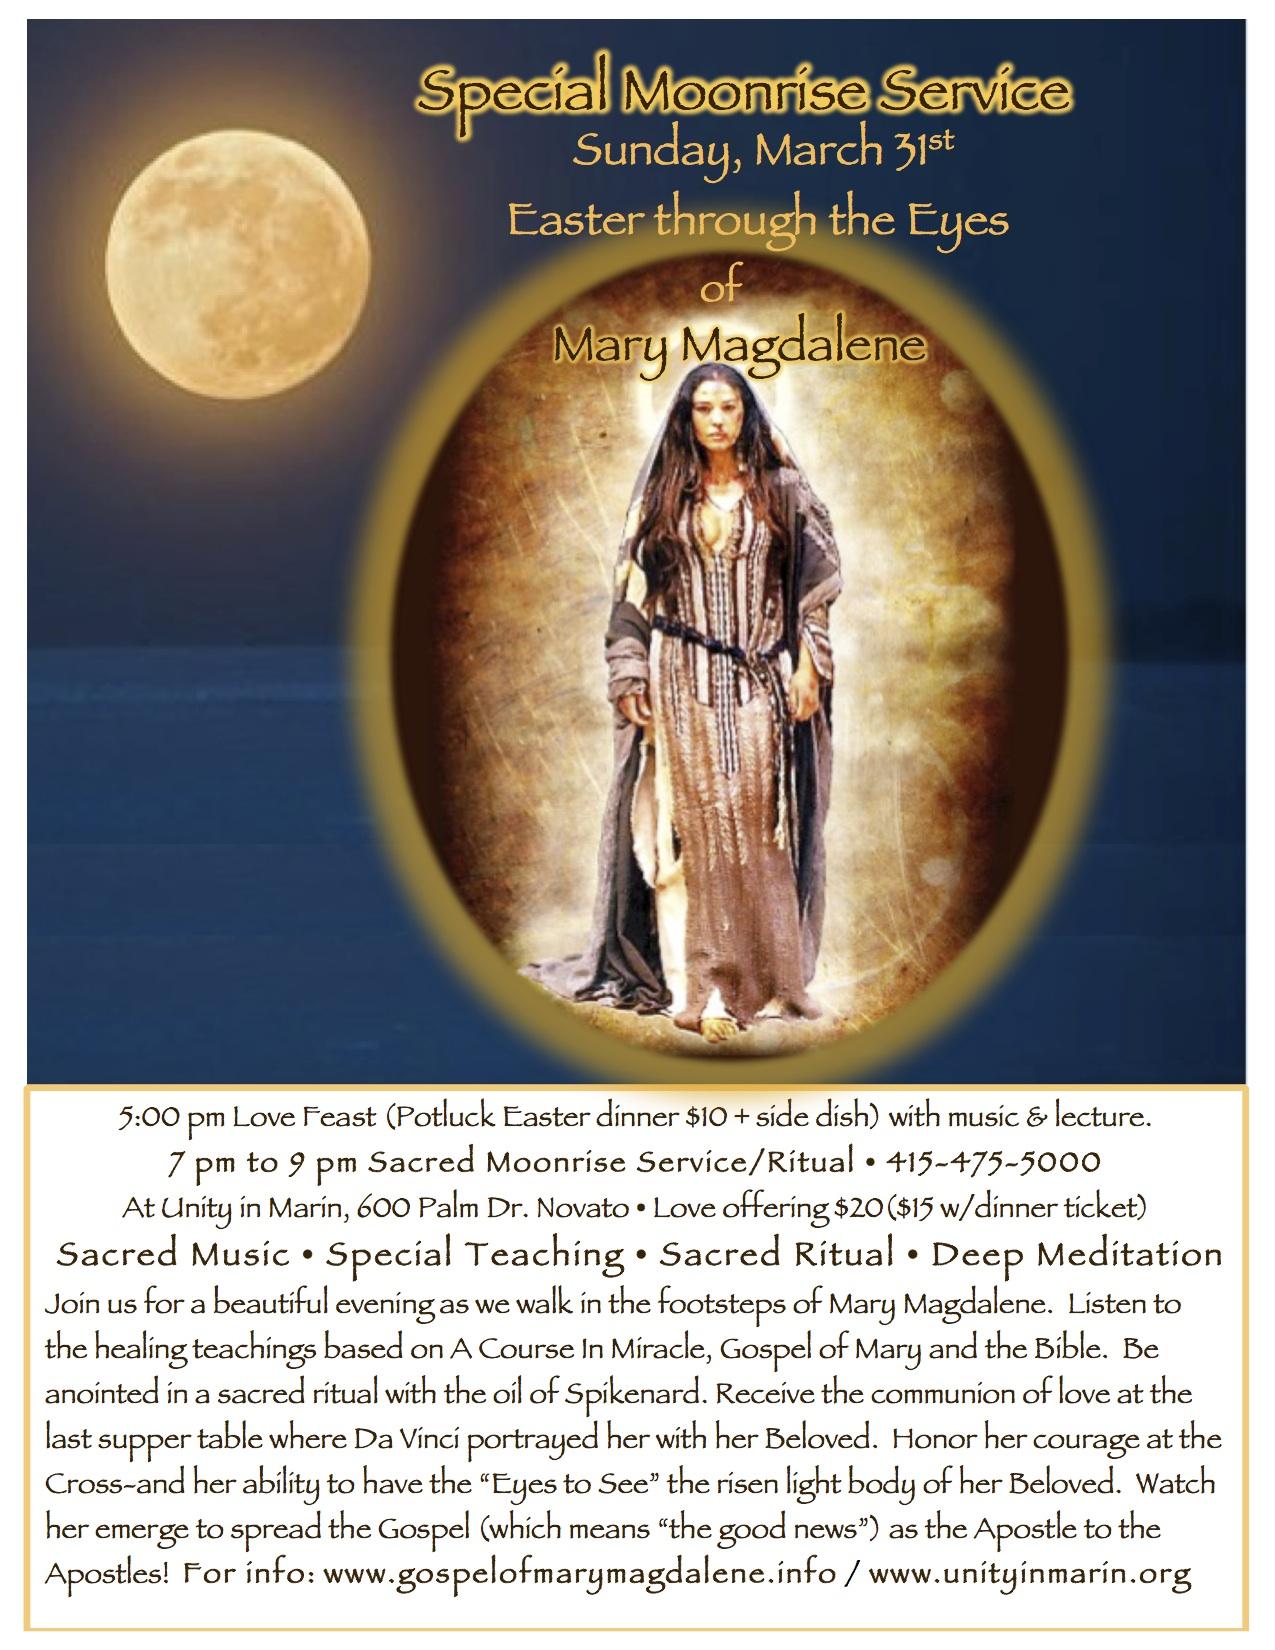 Easter Moonrise Service